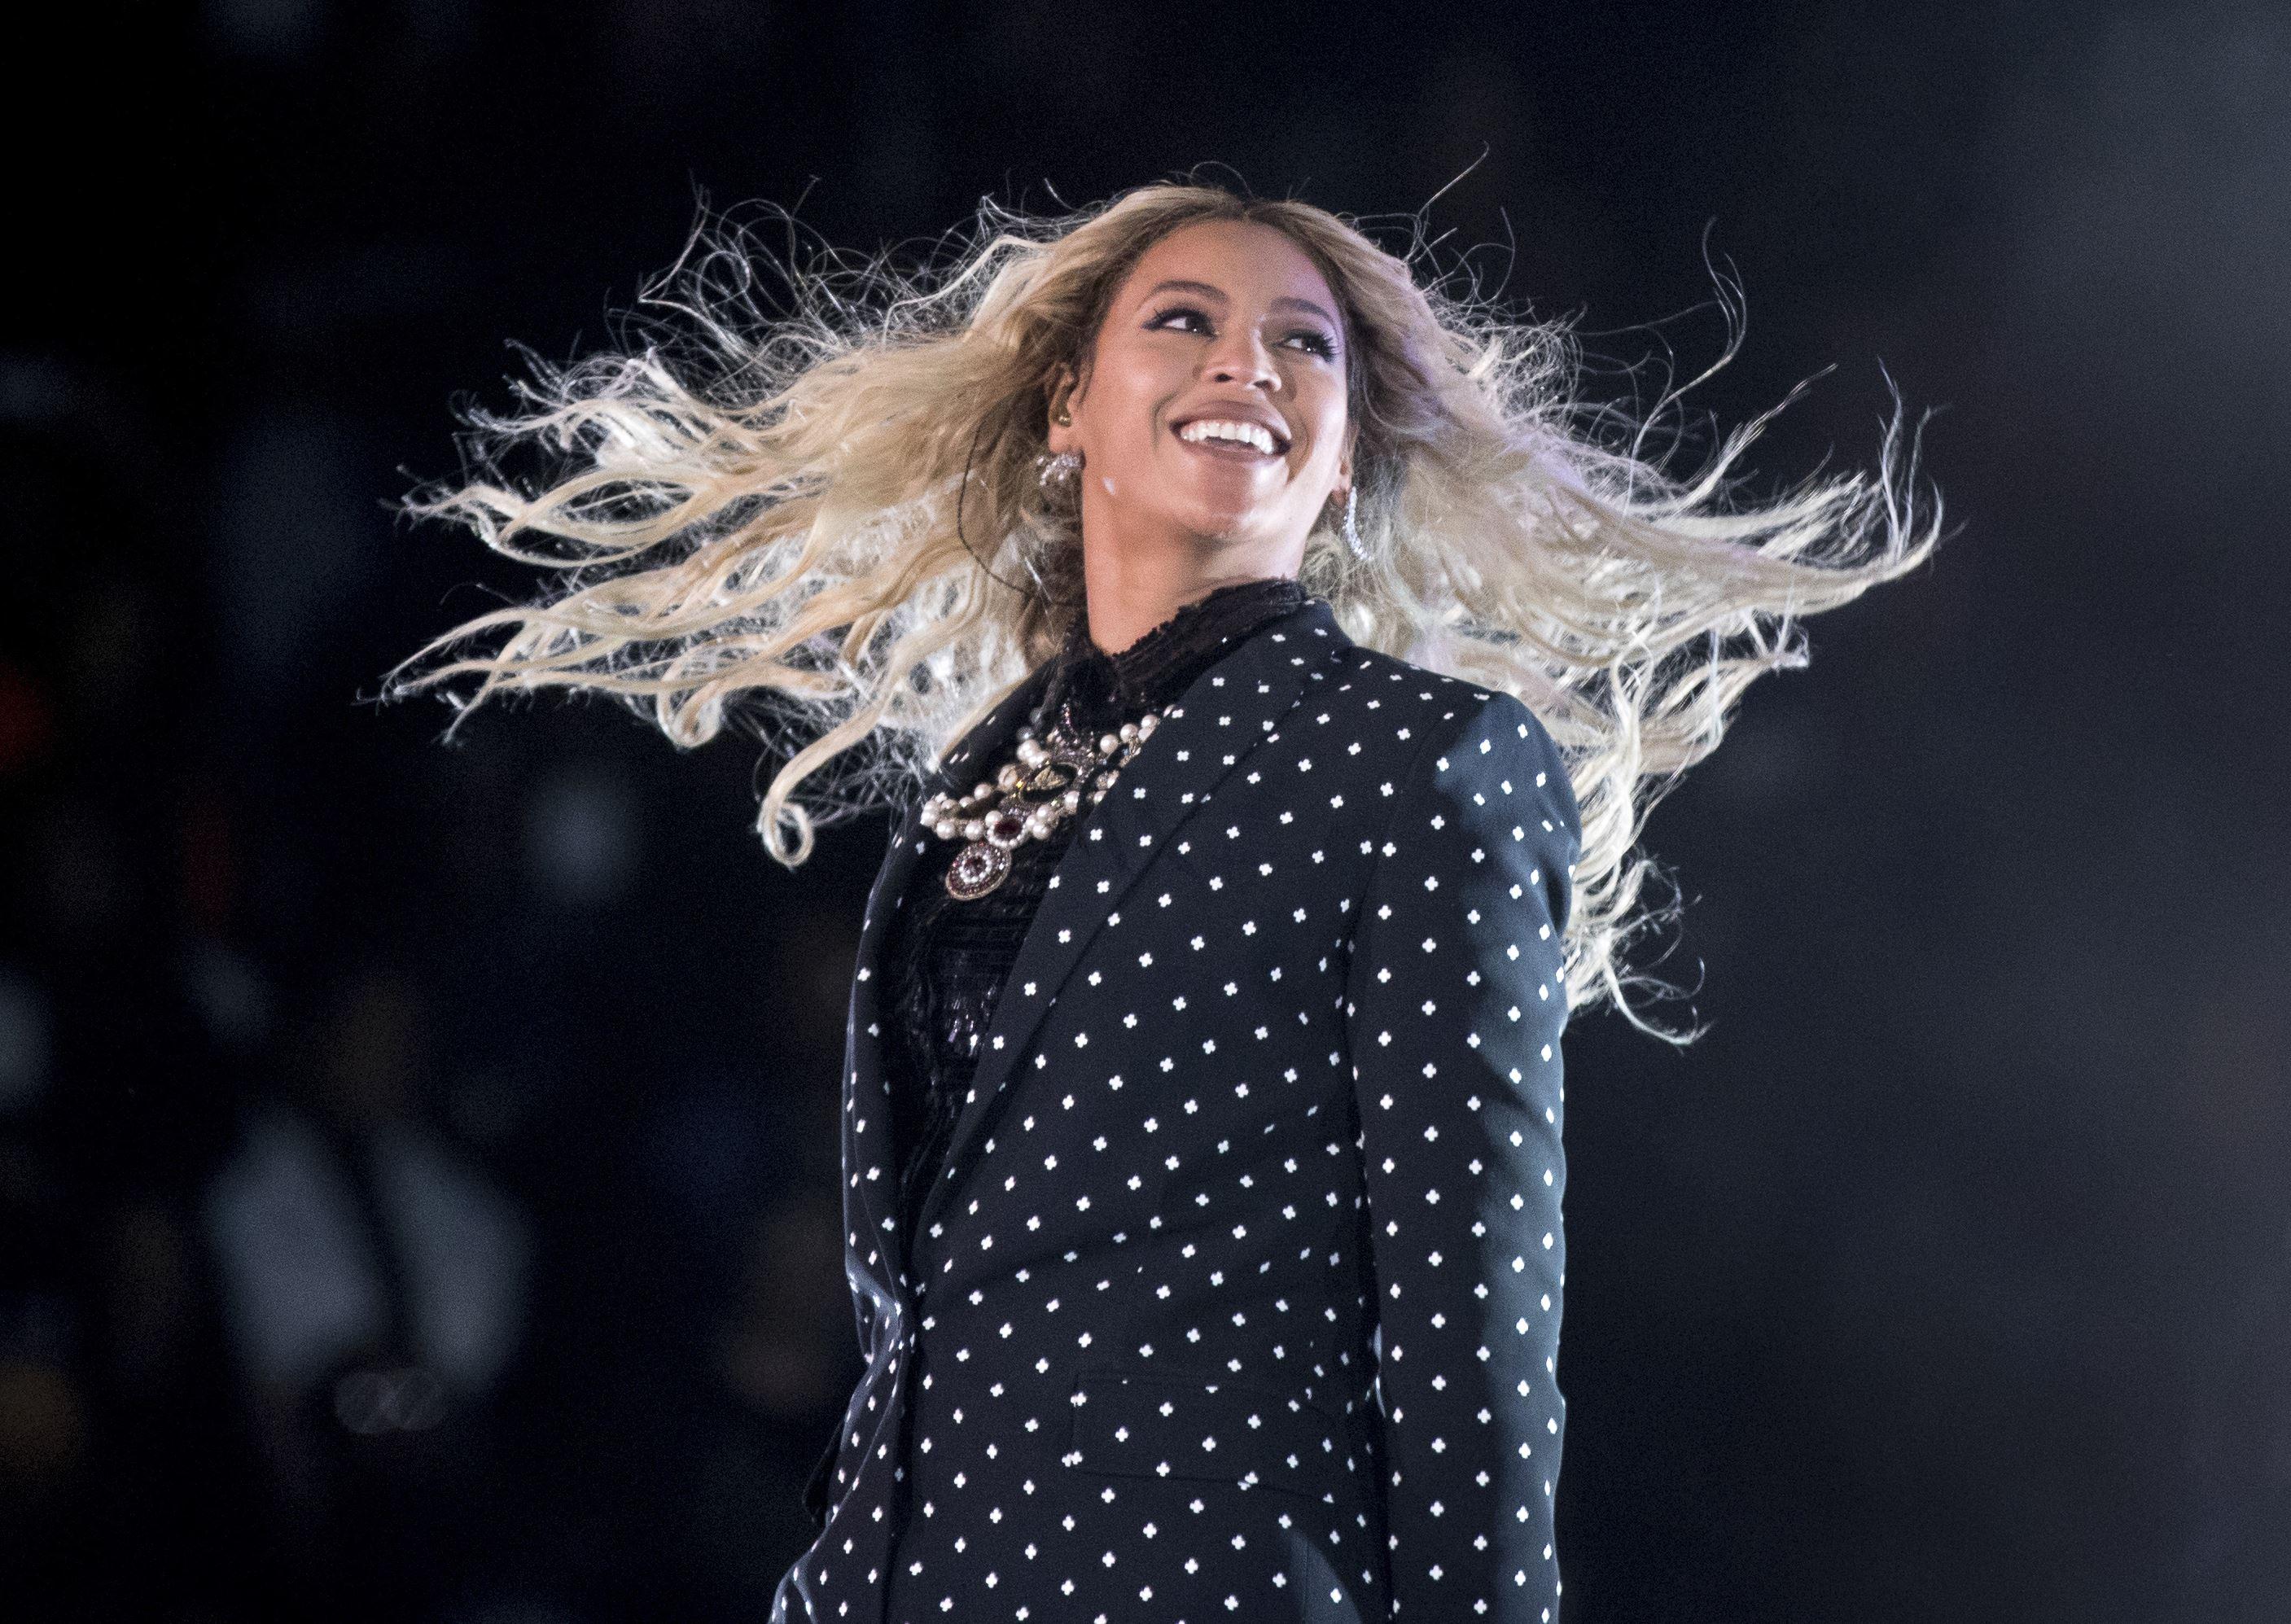 Beyonce Tour 2020.Beyonce 2020 Tour Tour 2020 Infiniteradio